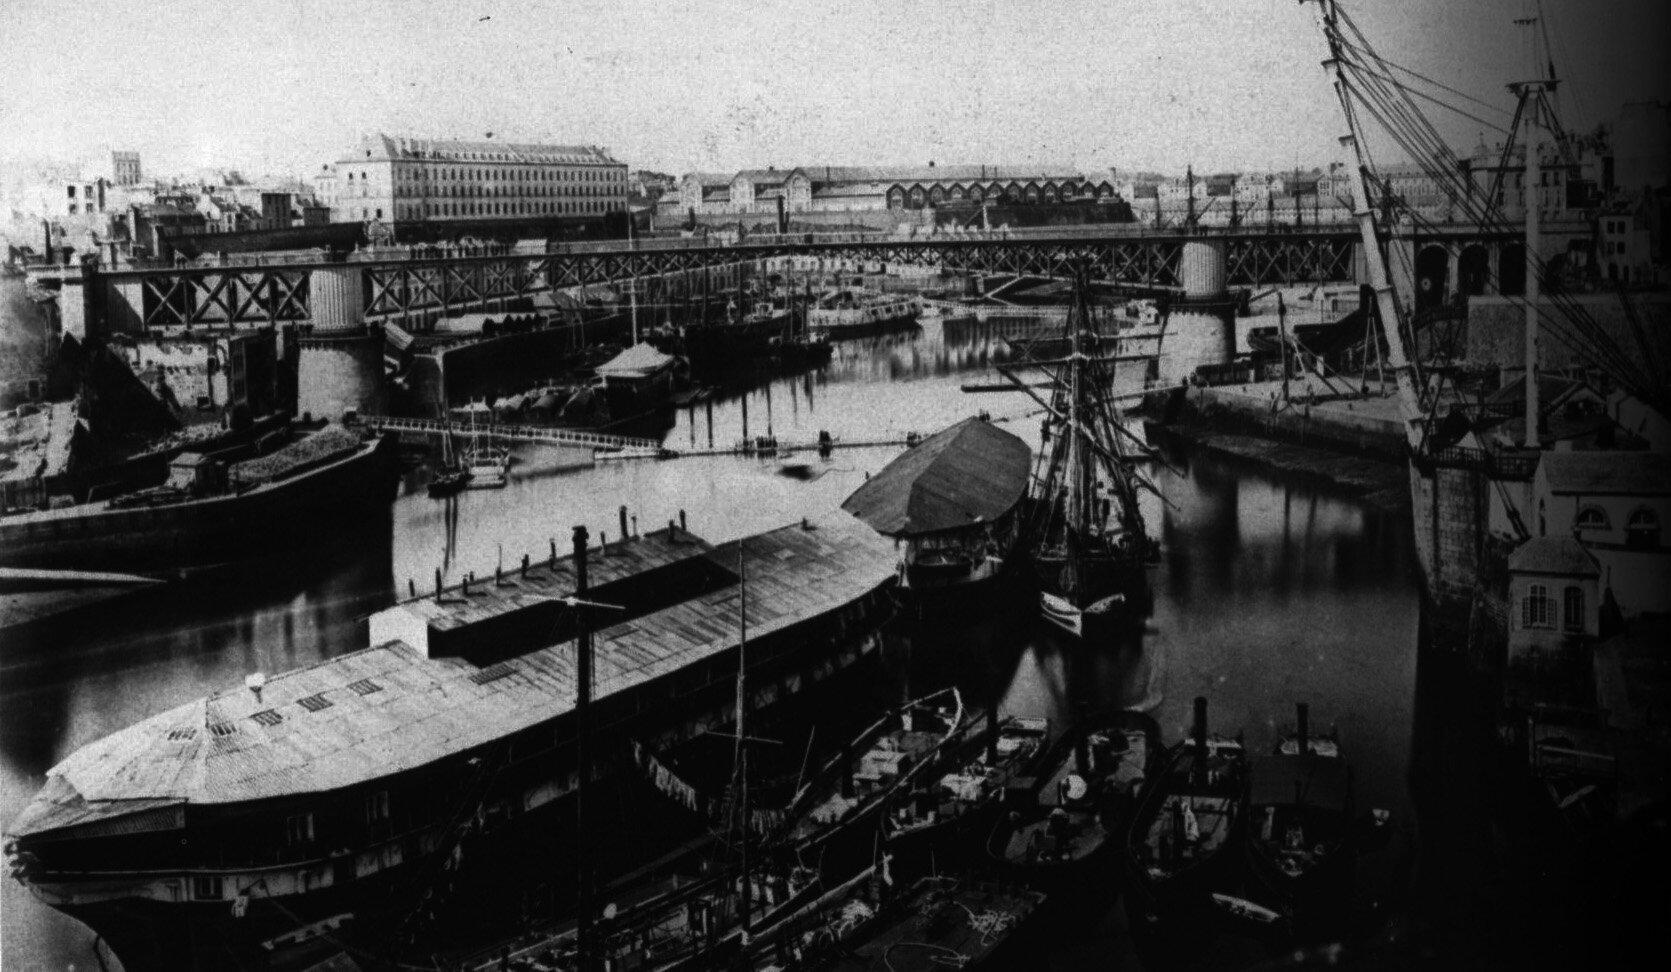 1852-1870 Le port de Brest agrandi